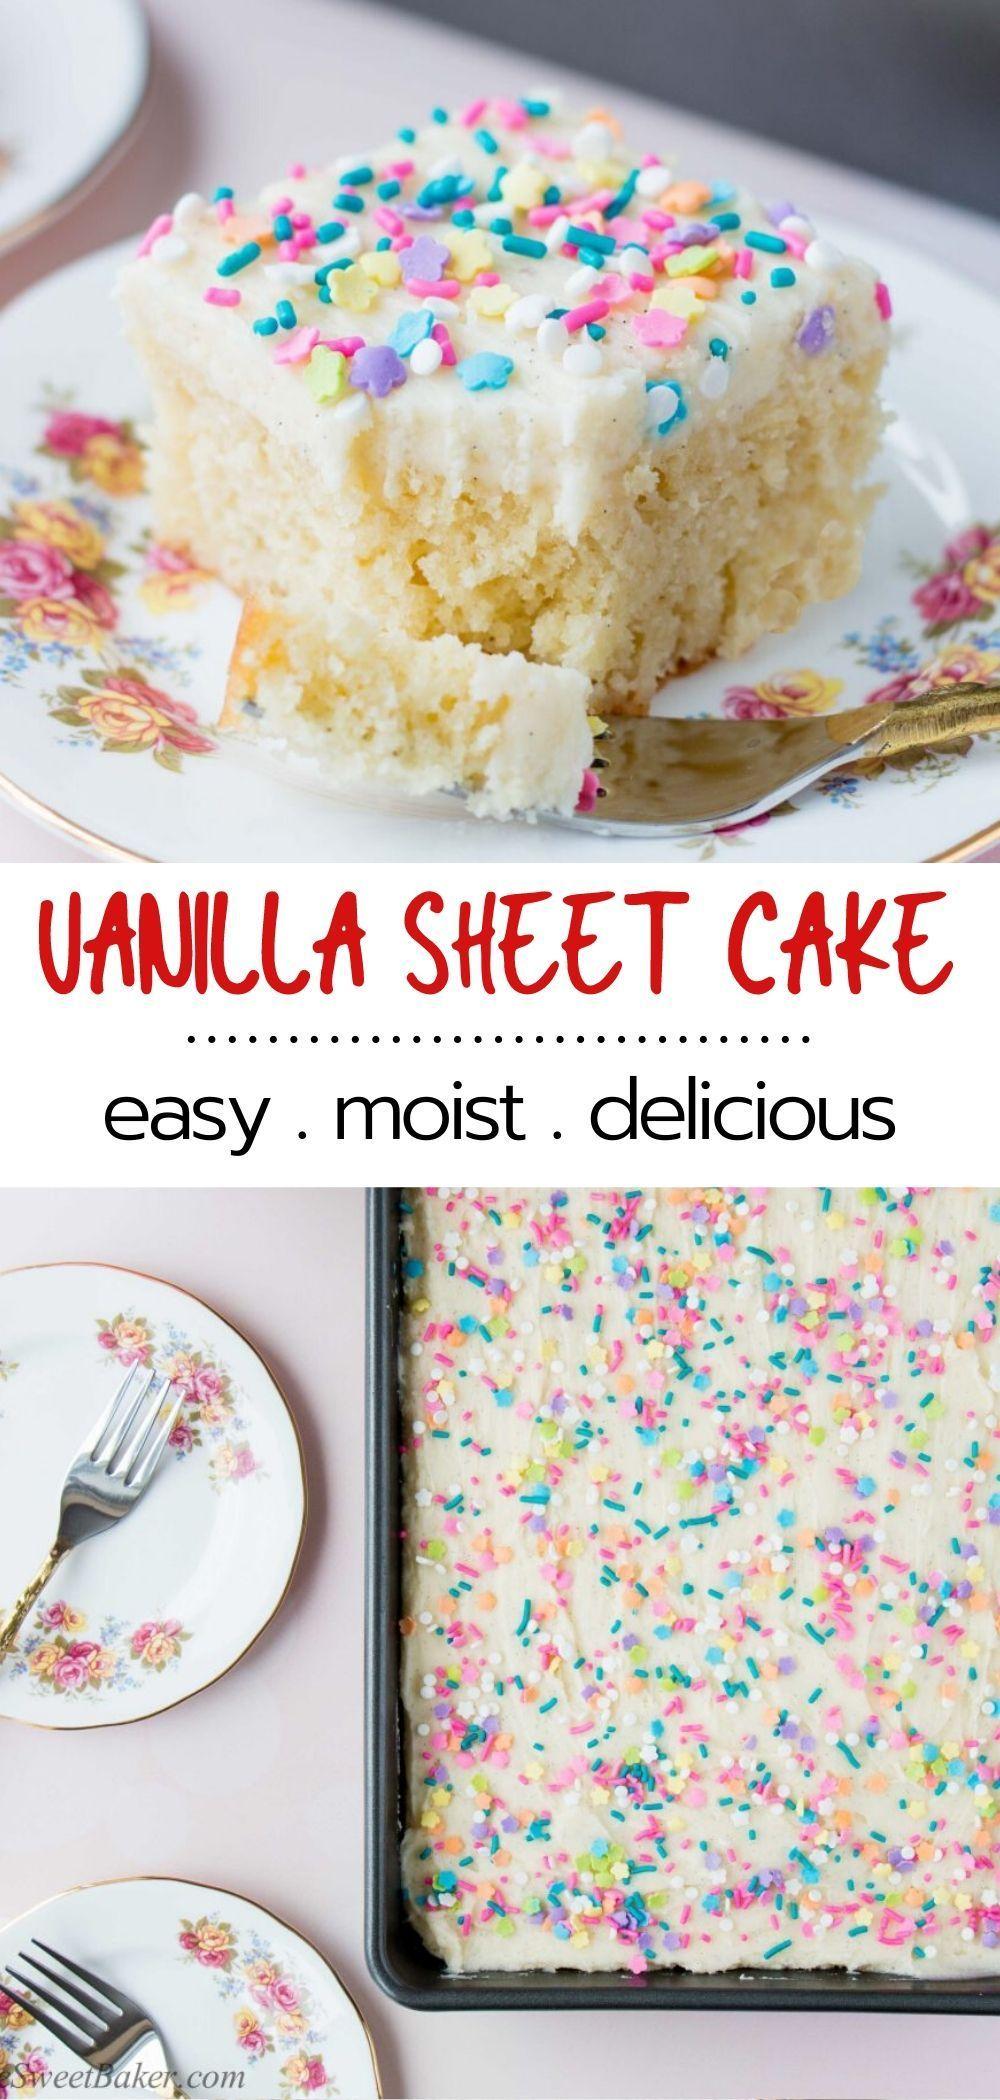 Vanilla Sheet Cake with Whipped Vanilla Buttercream